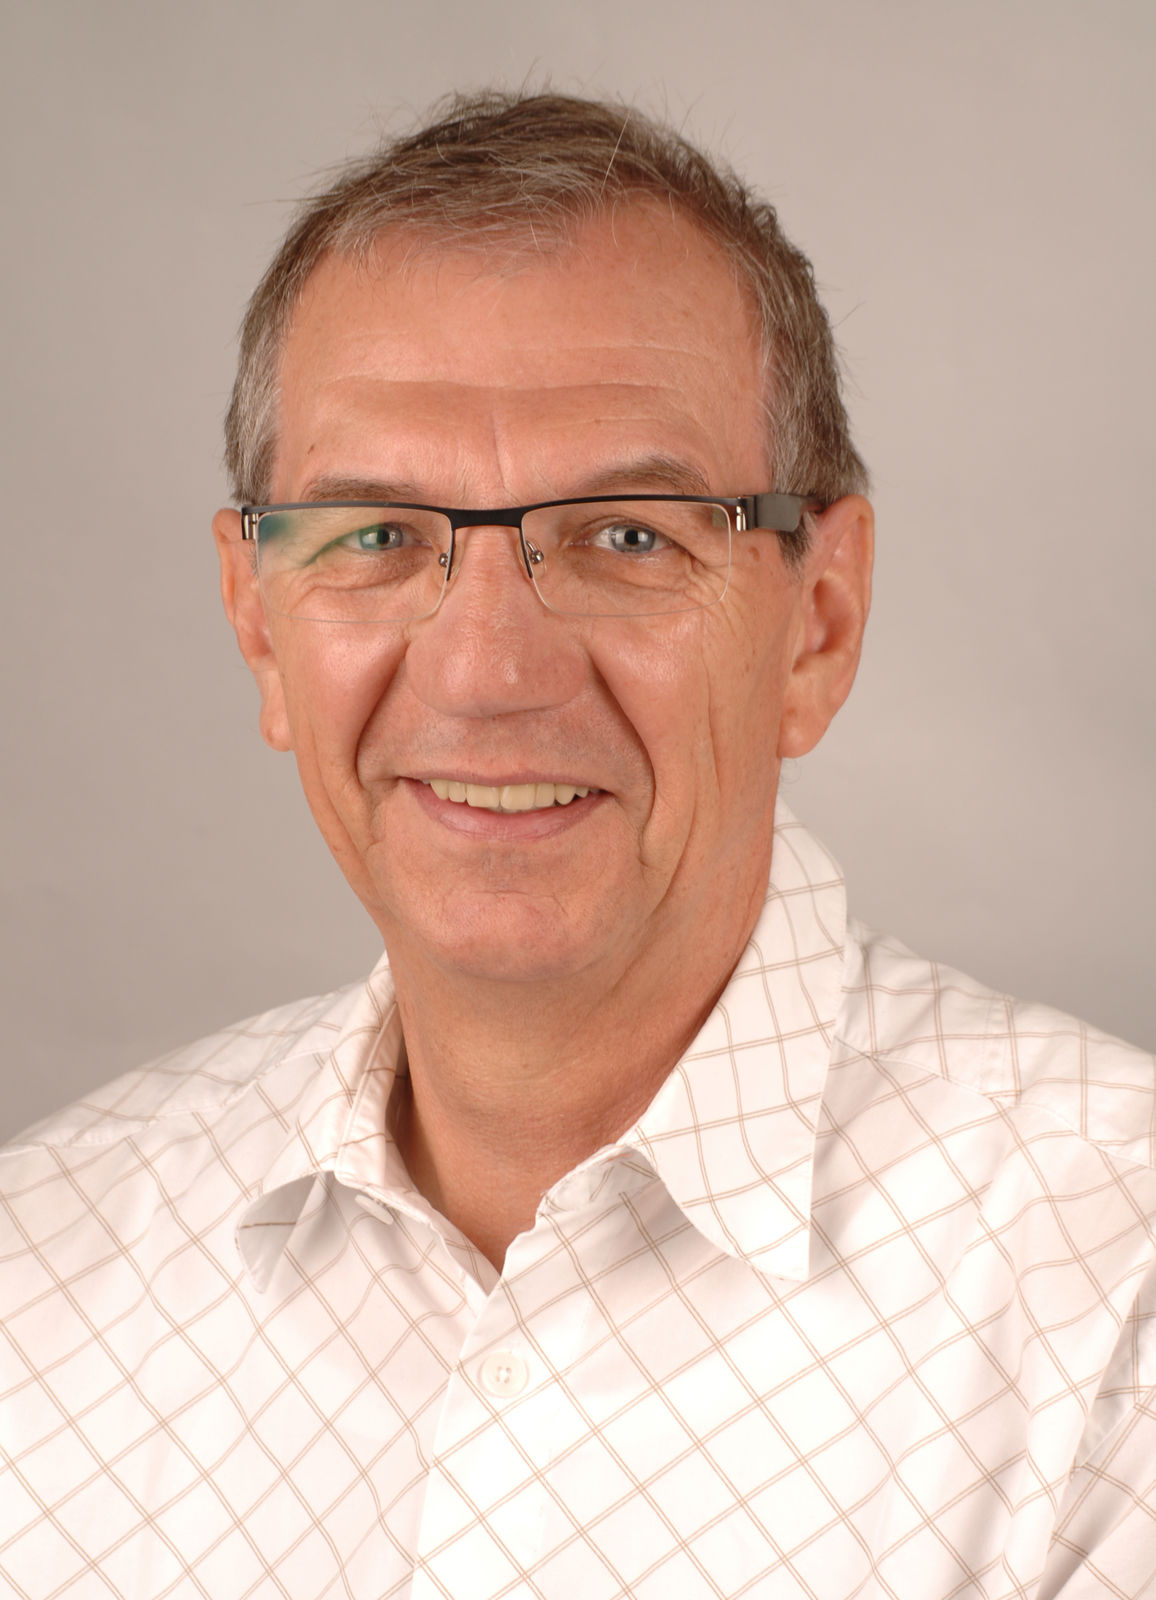 Hans-Jürgen Furchtmann